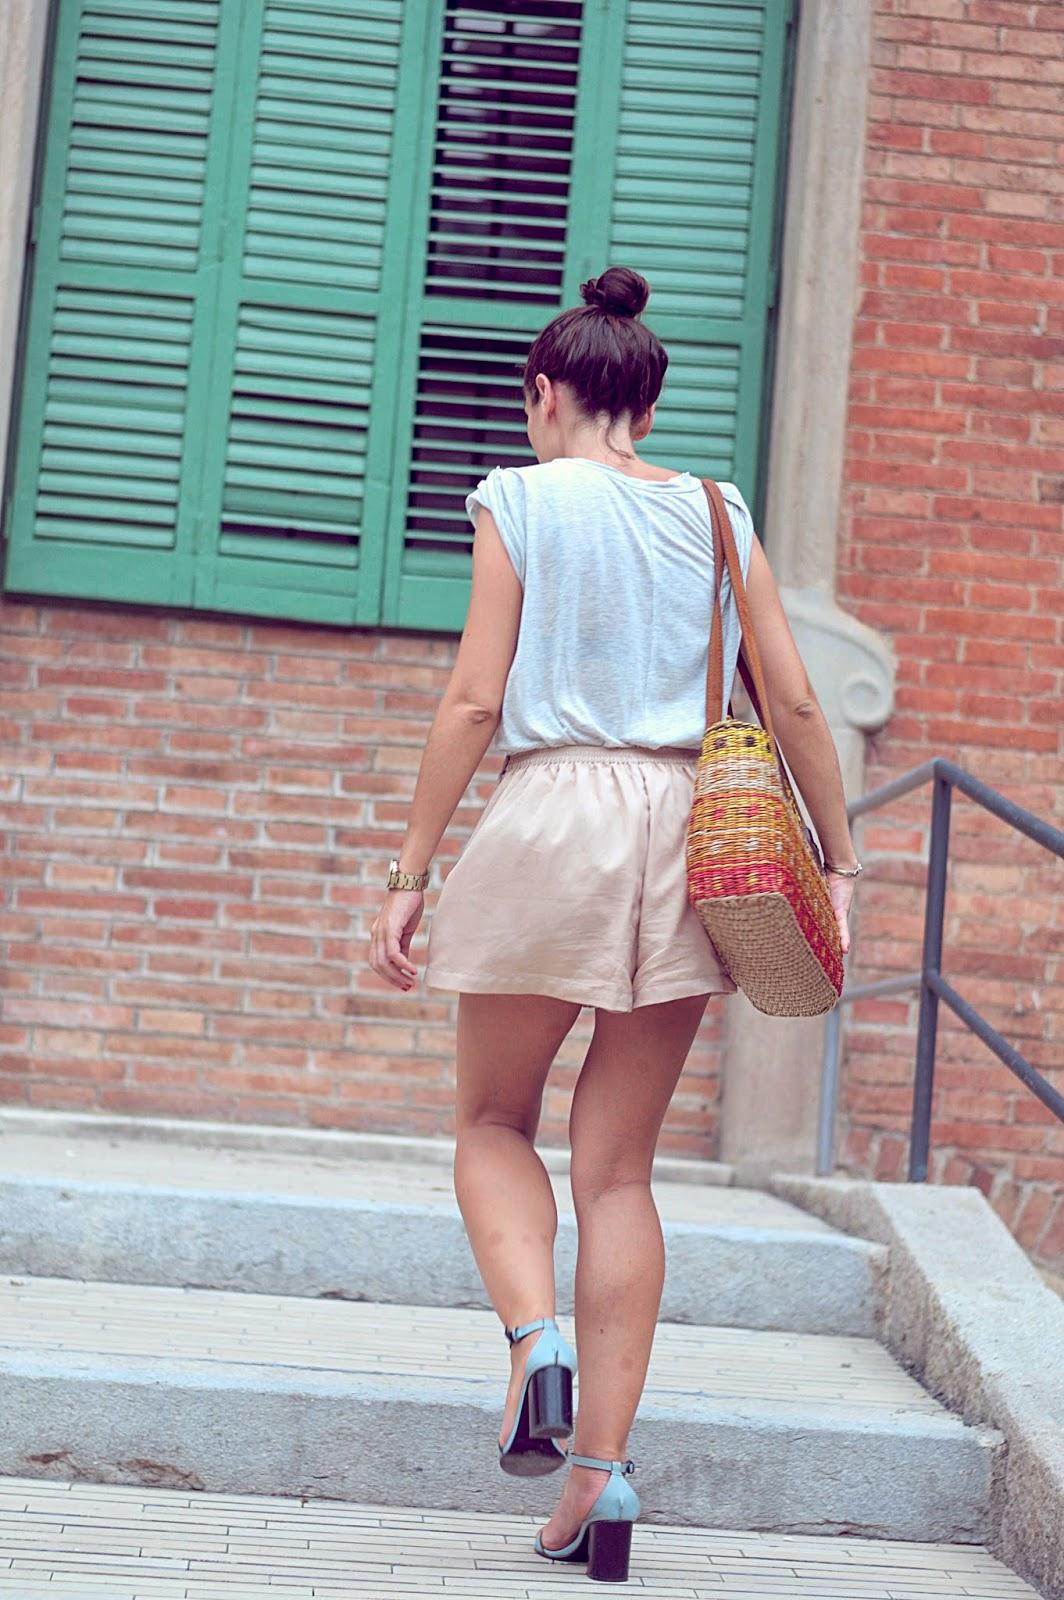 sandalias zara, camiseta zara, shorts pepa loves, bolso pou nou